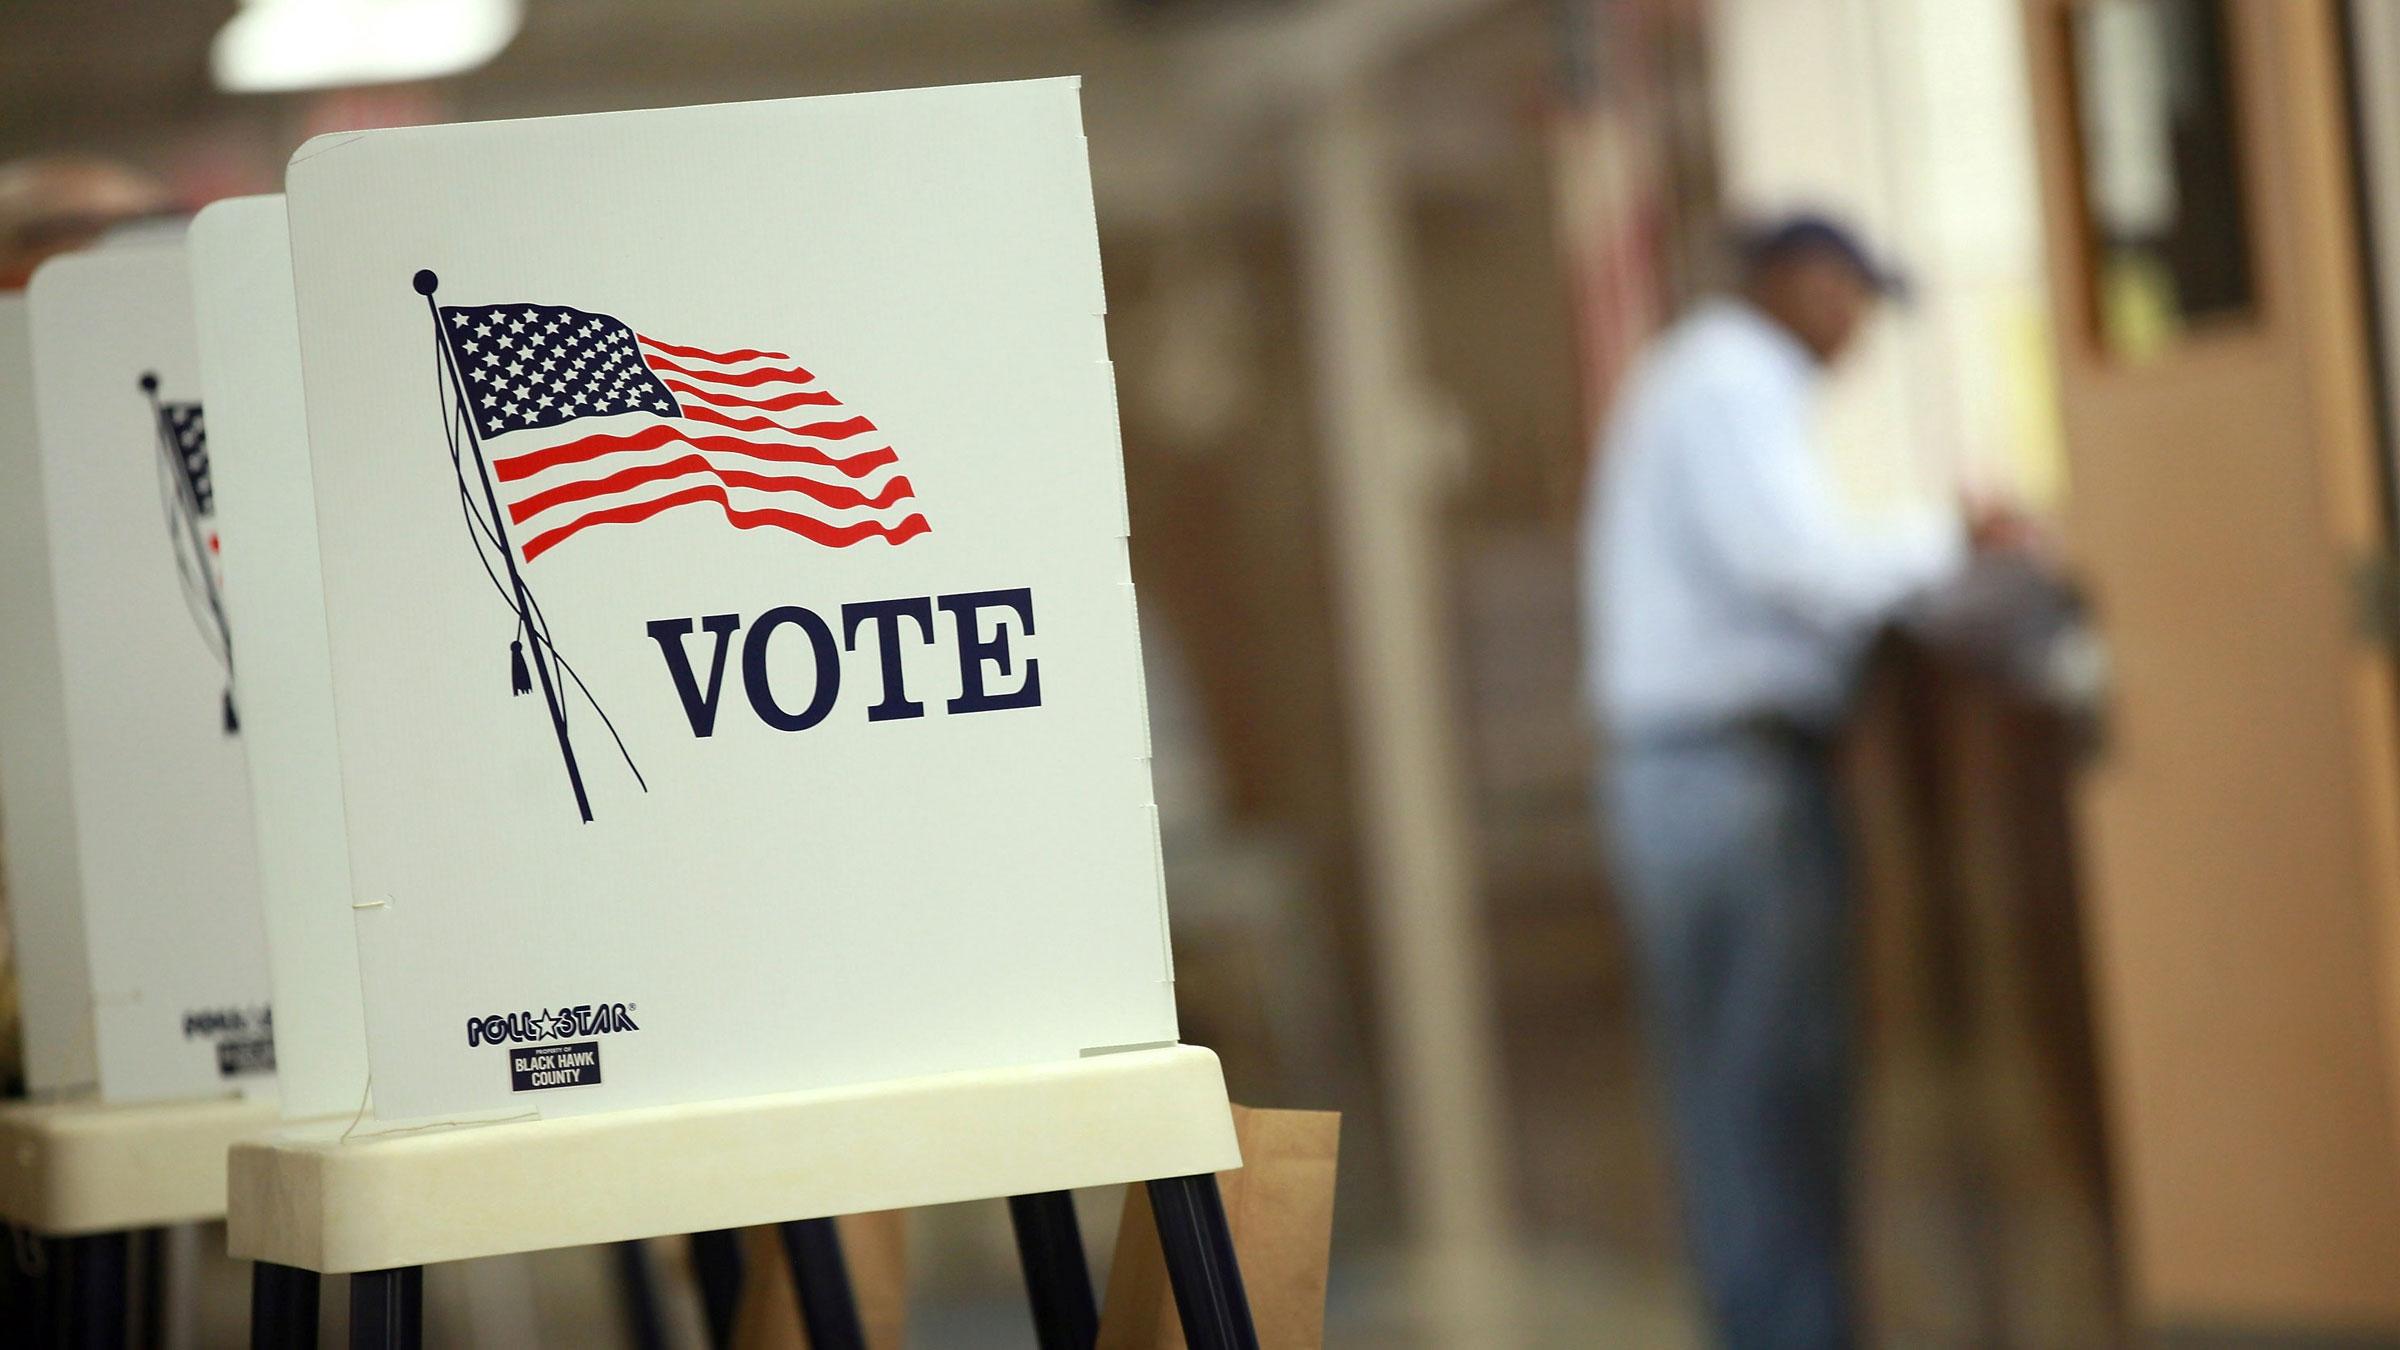 Albuquerque Runoff Election Information